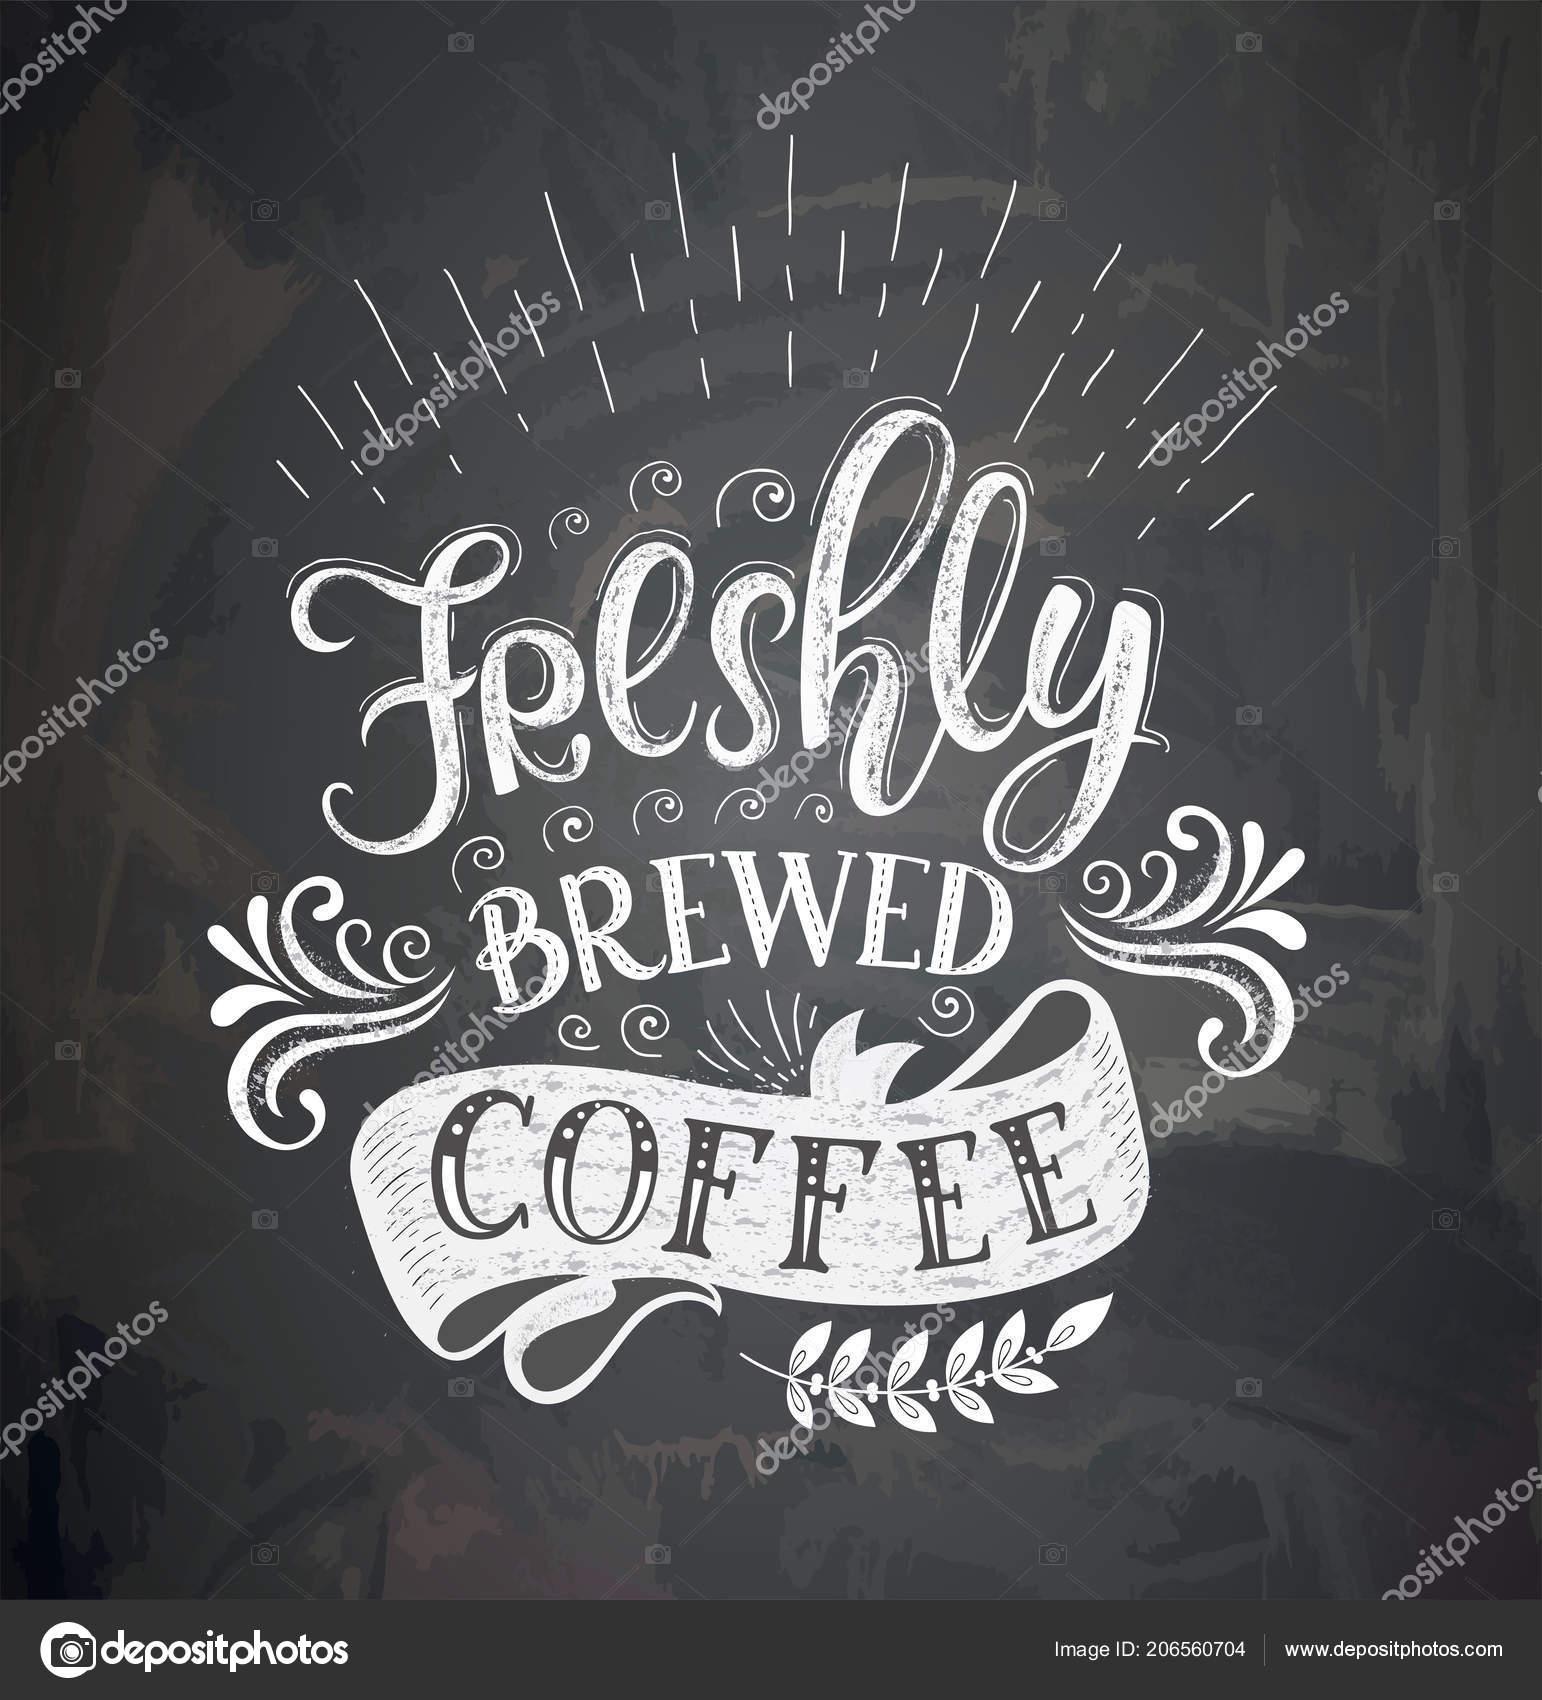 Coffee Quotes On The Chalk Board Stock Vector Nuraschka 206560704